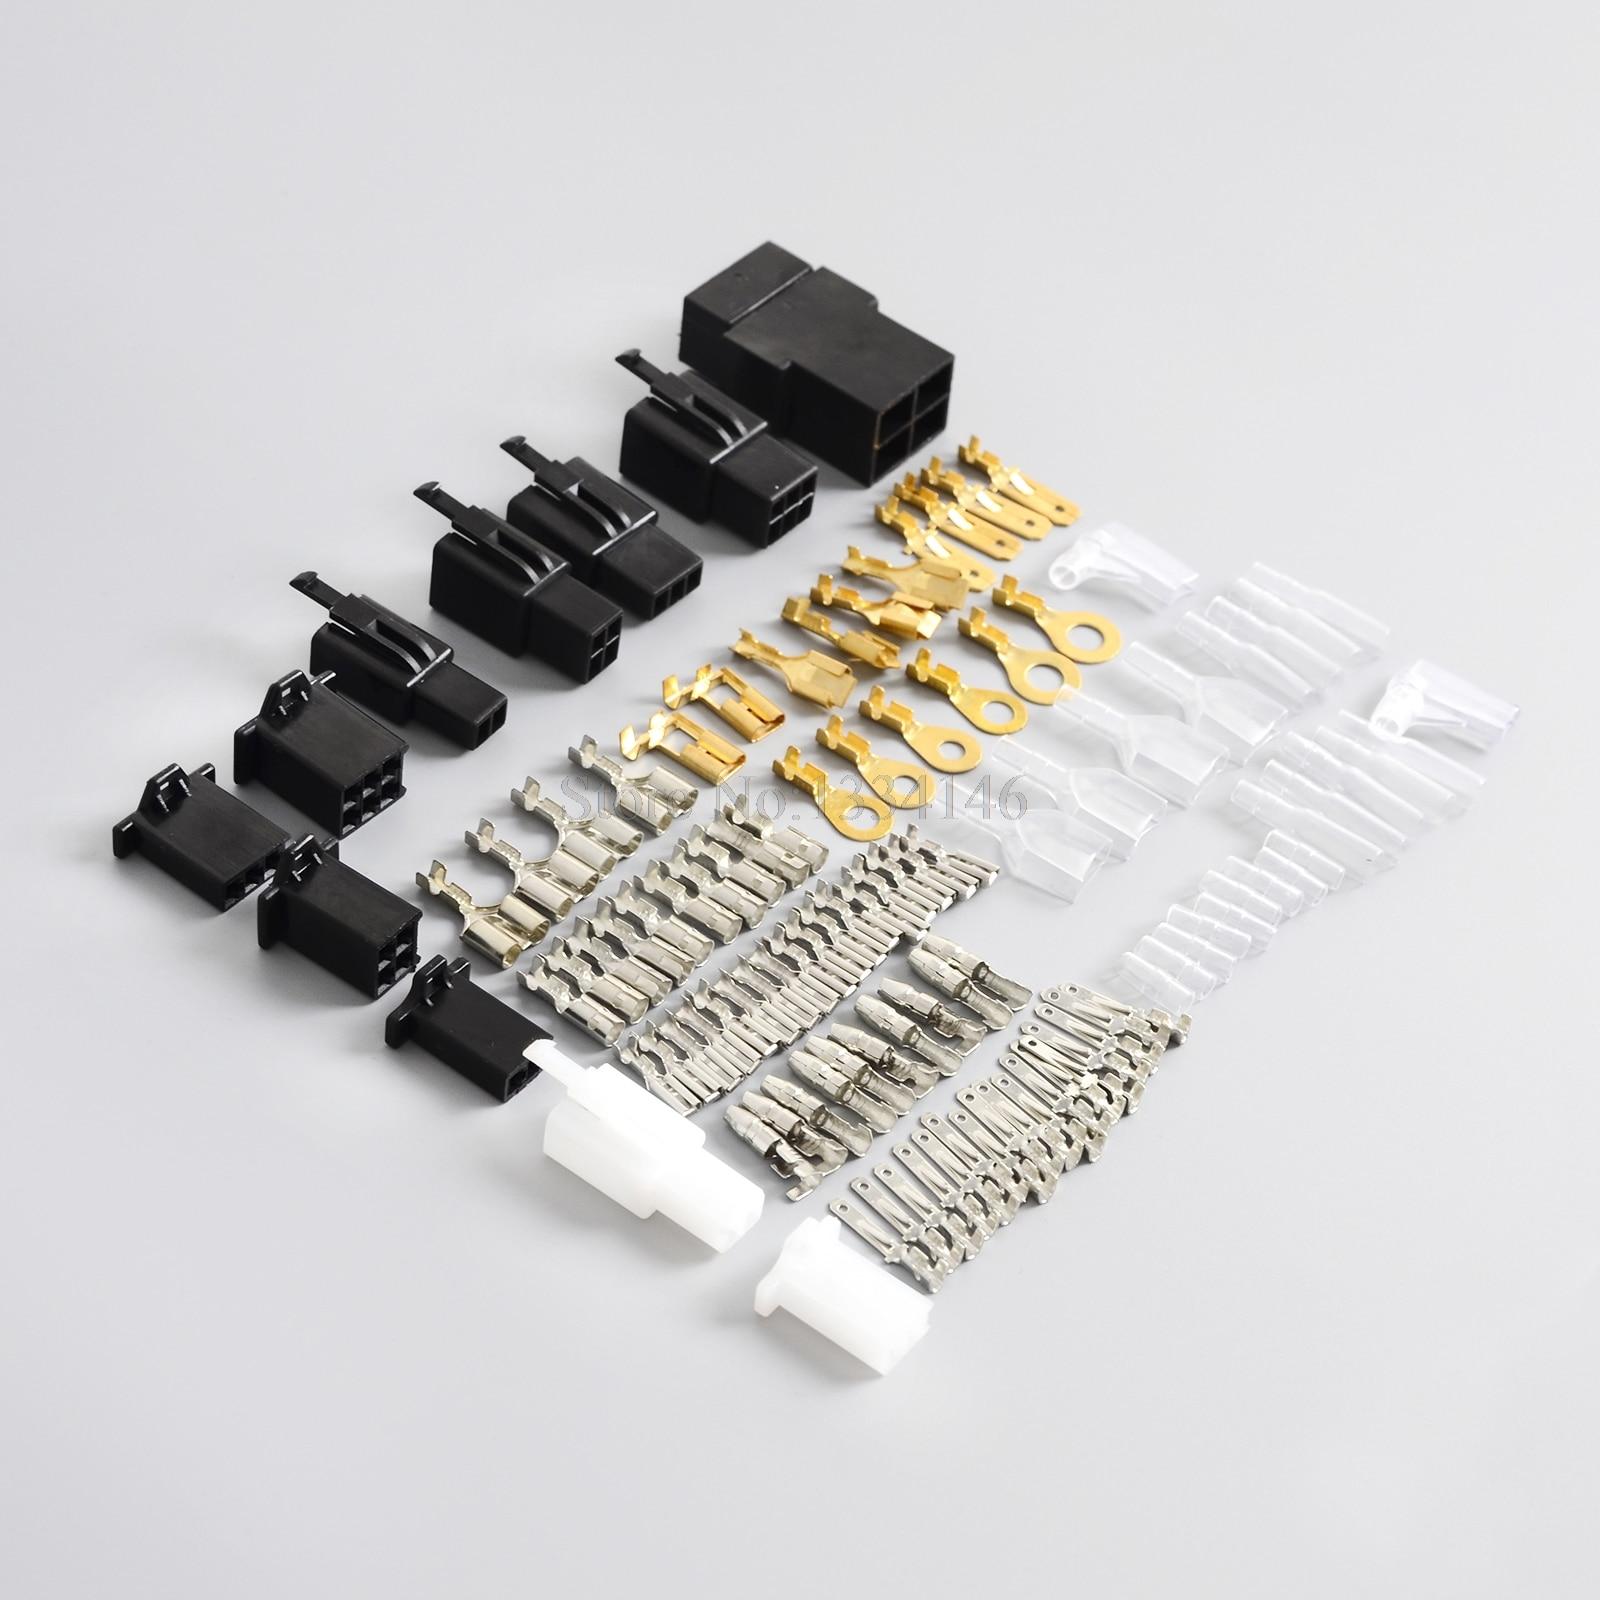 medium resolution of universal motorcycle wiring harness loom repair kit plugs bullet connectors for honda yamaha suzuki kawasaki